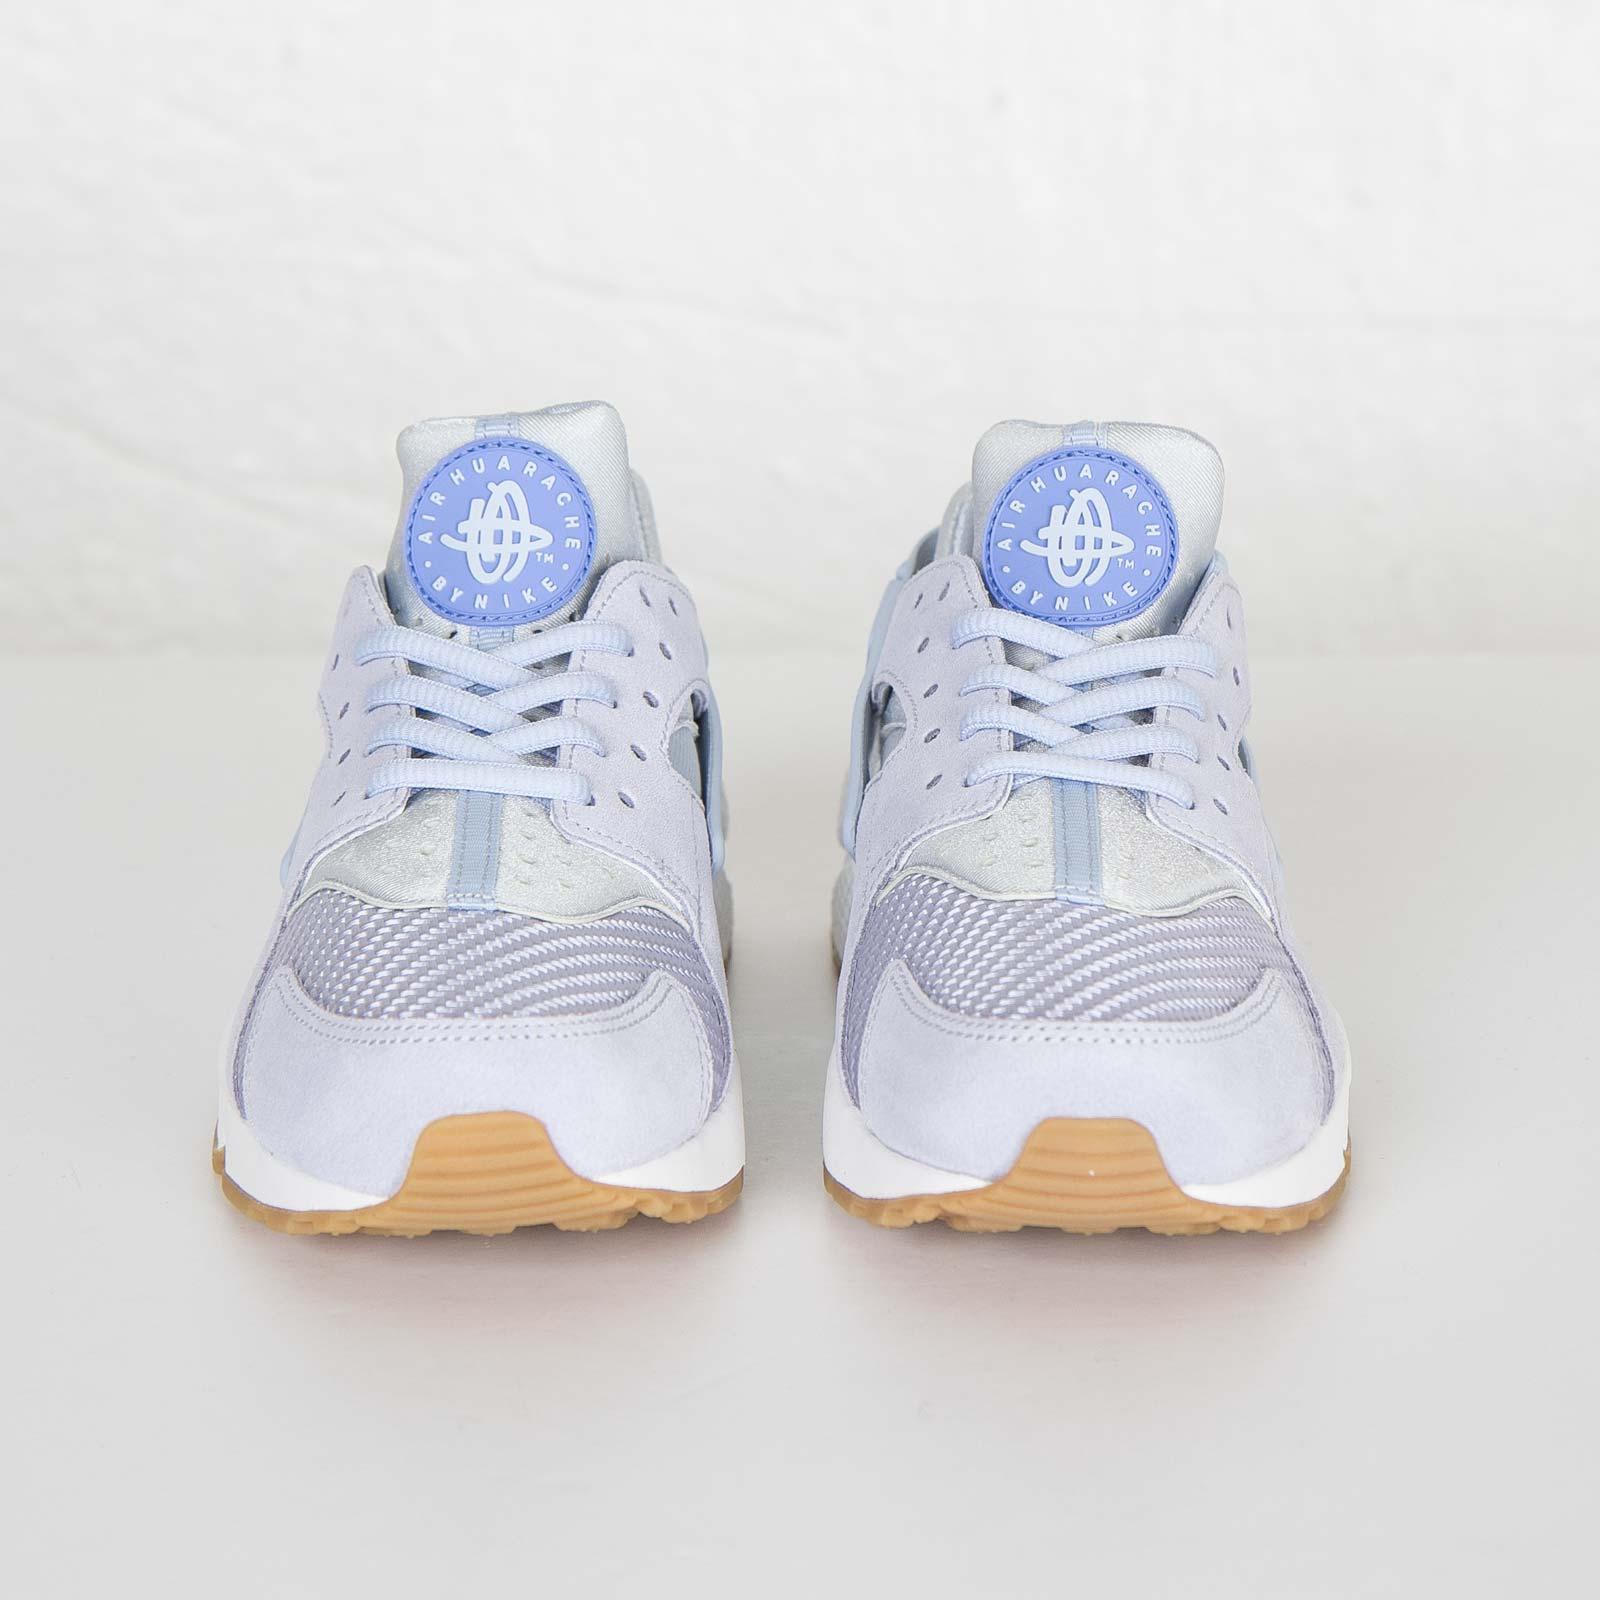 sports shoes 34e2c 3a1d3 Nike W Air Huarache Run TXT - 818597-400 - Sneakersnstuff   sneakers    streetwear online since 1999